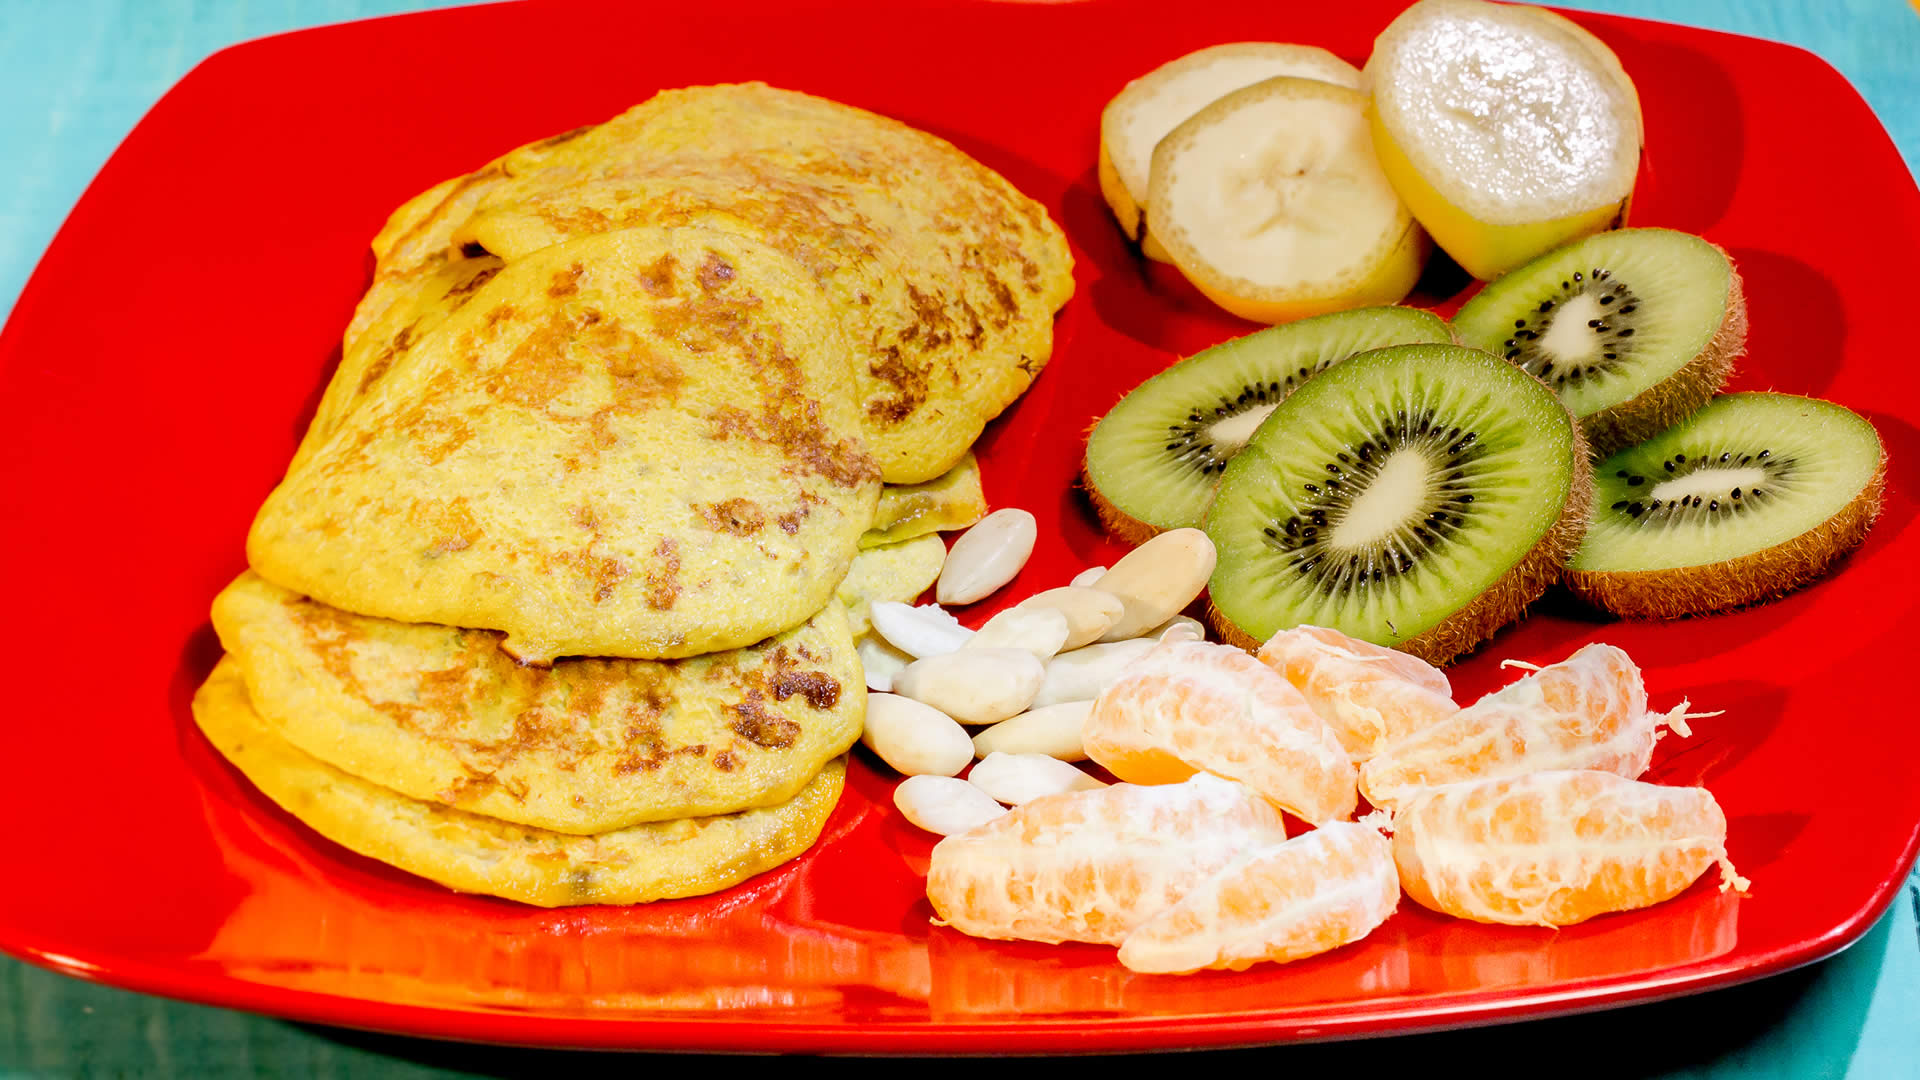 Foto Pancake 2 Ingredienti - Senza Burro, Farina, Latte, Zucchero